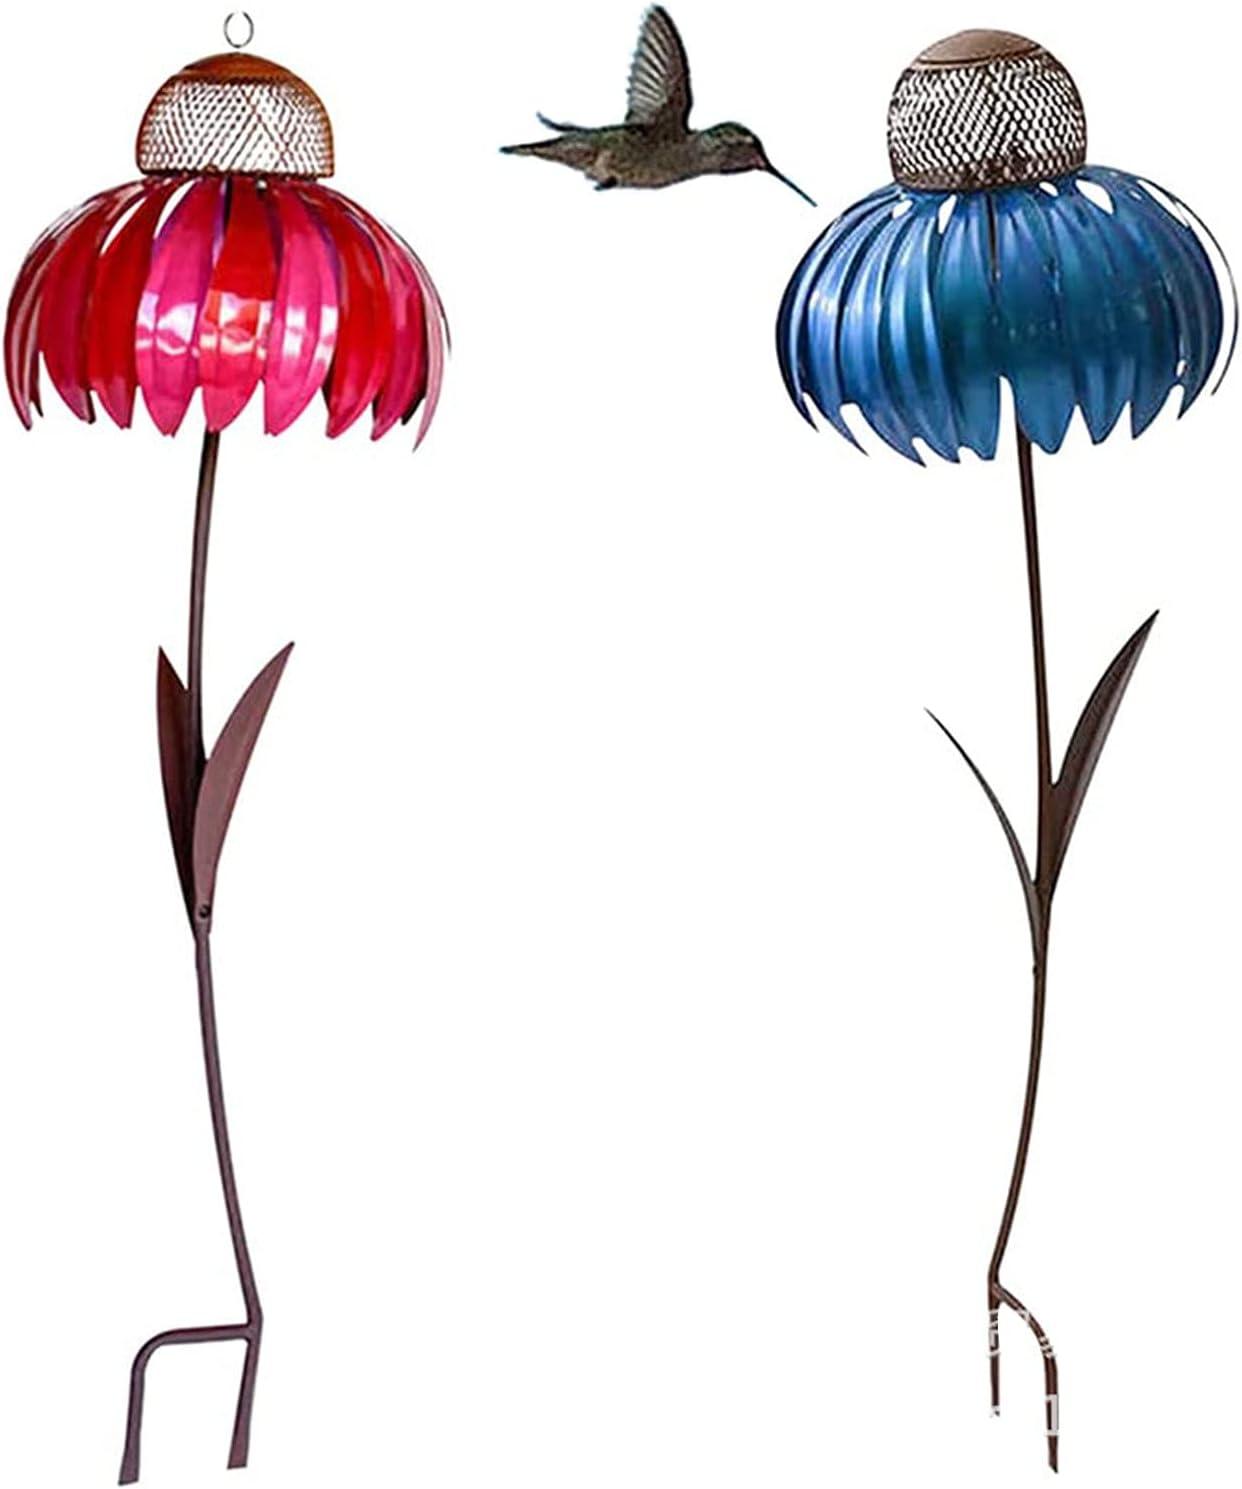 2PC Coneflower Outdoor Standing Bird Feeder Outside Rust Resistant Metal Garden Art Flower Stakes Stand with Food Bowl Wild Bird Feeder for Bird Watching Garden Decoration (Red&Blue)